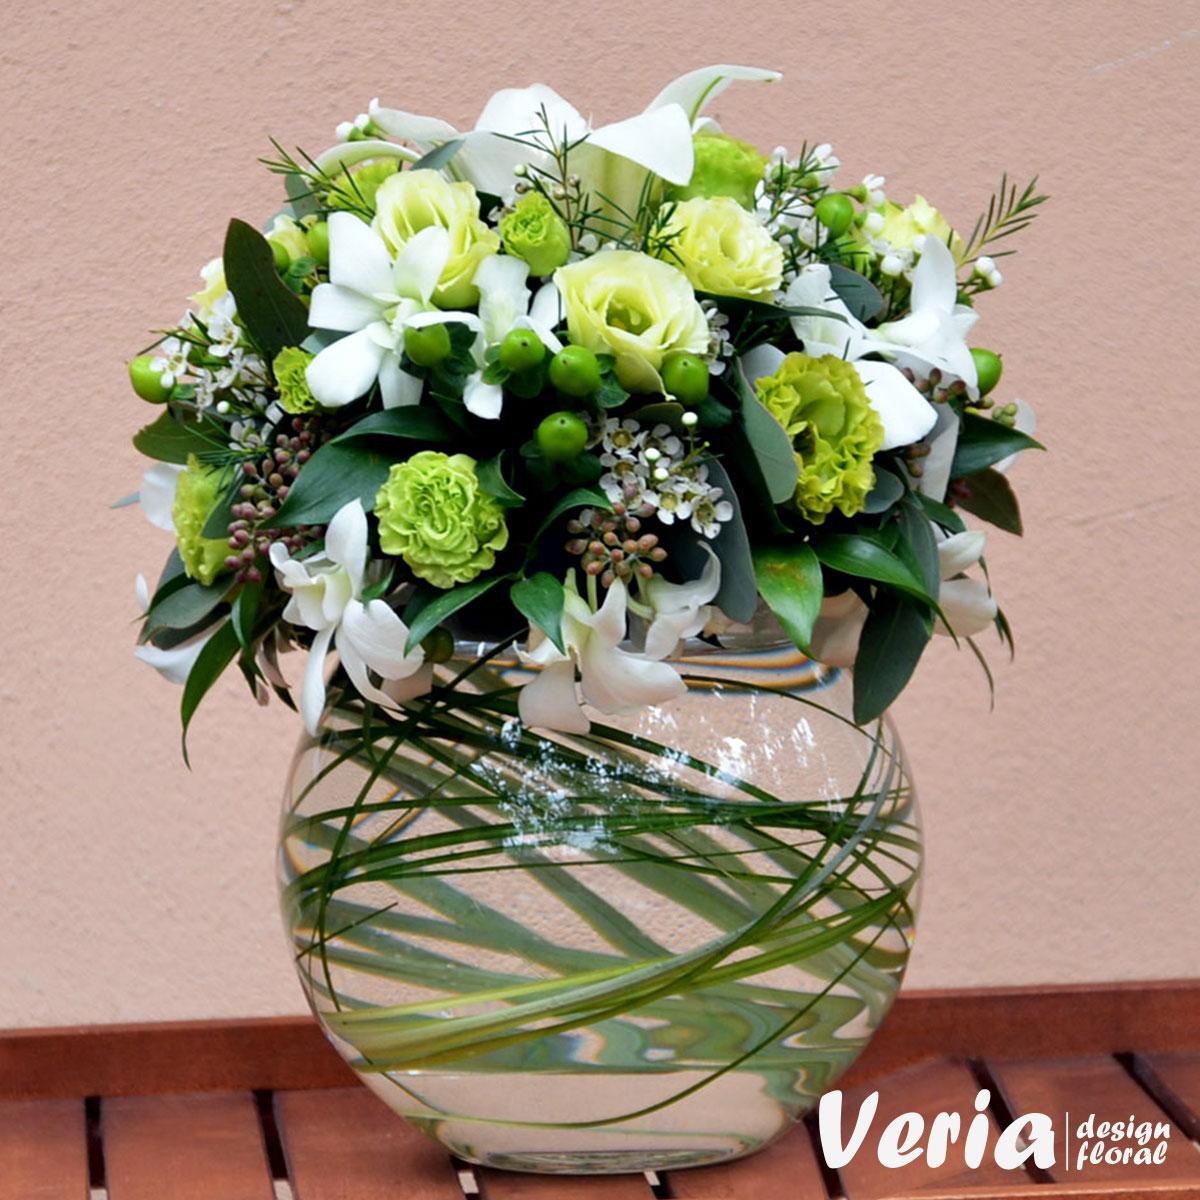 Aranjament Flori Albe Si Verzi Pe Bol Comanda Aranjamente Festive